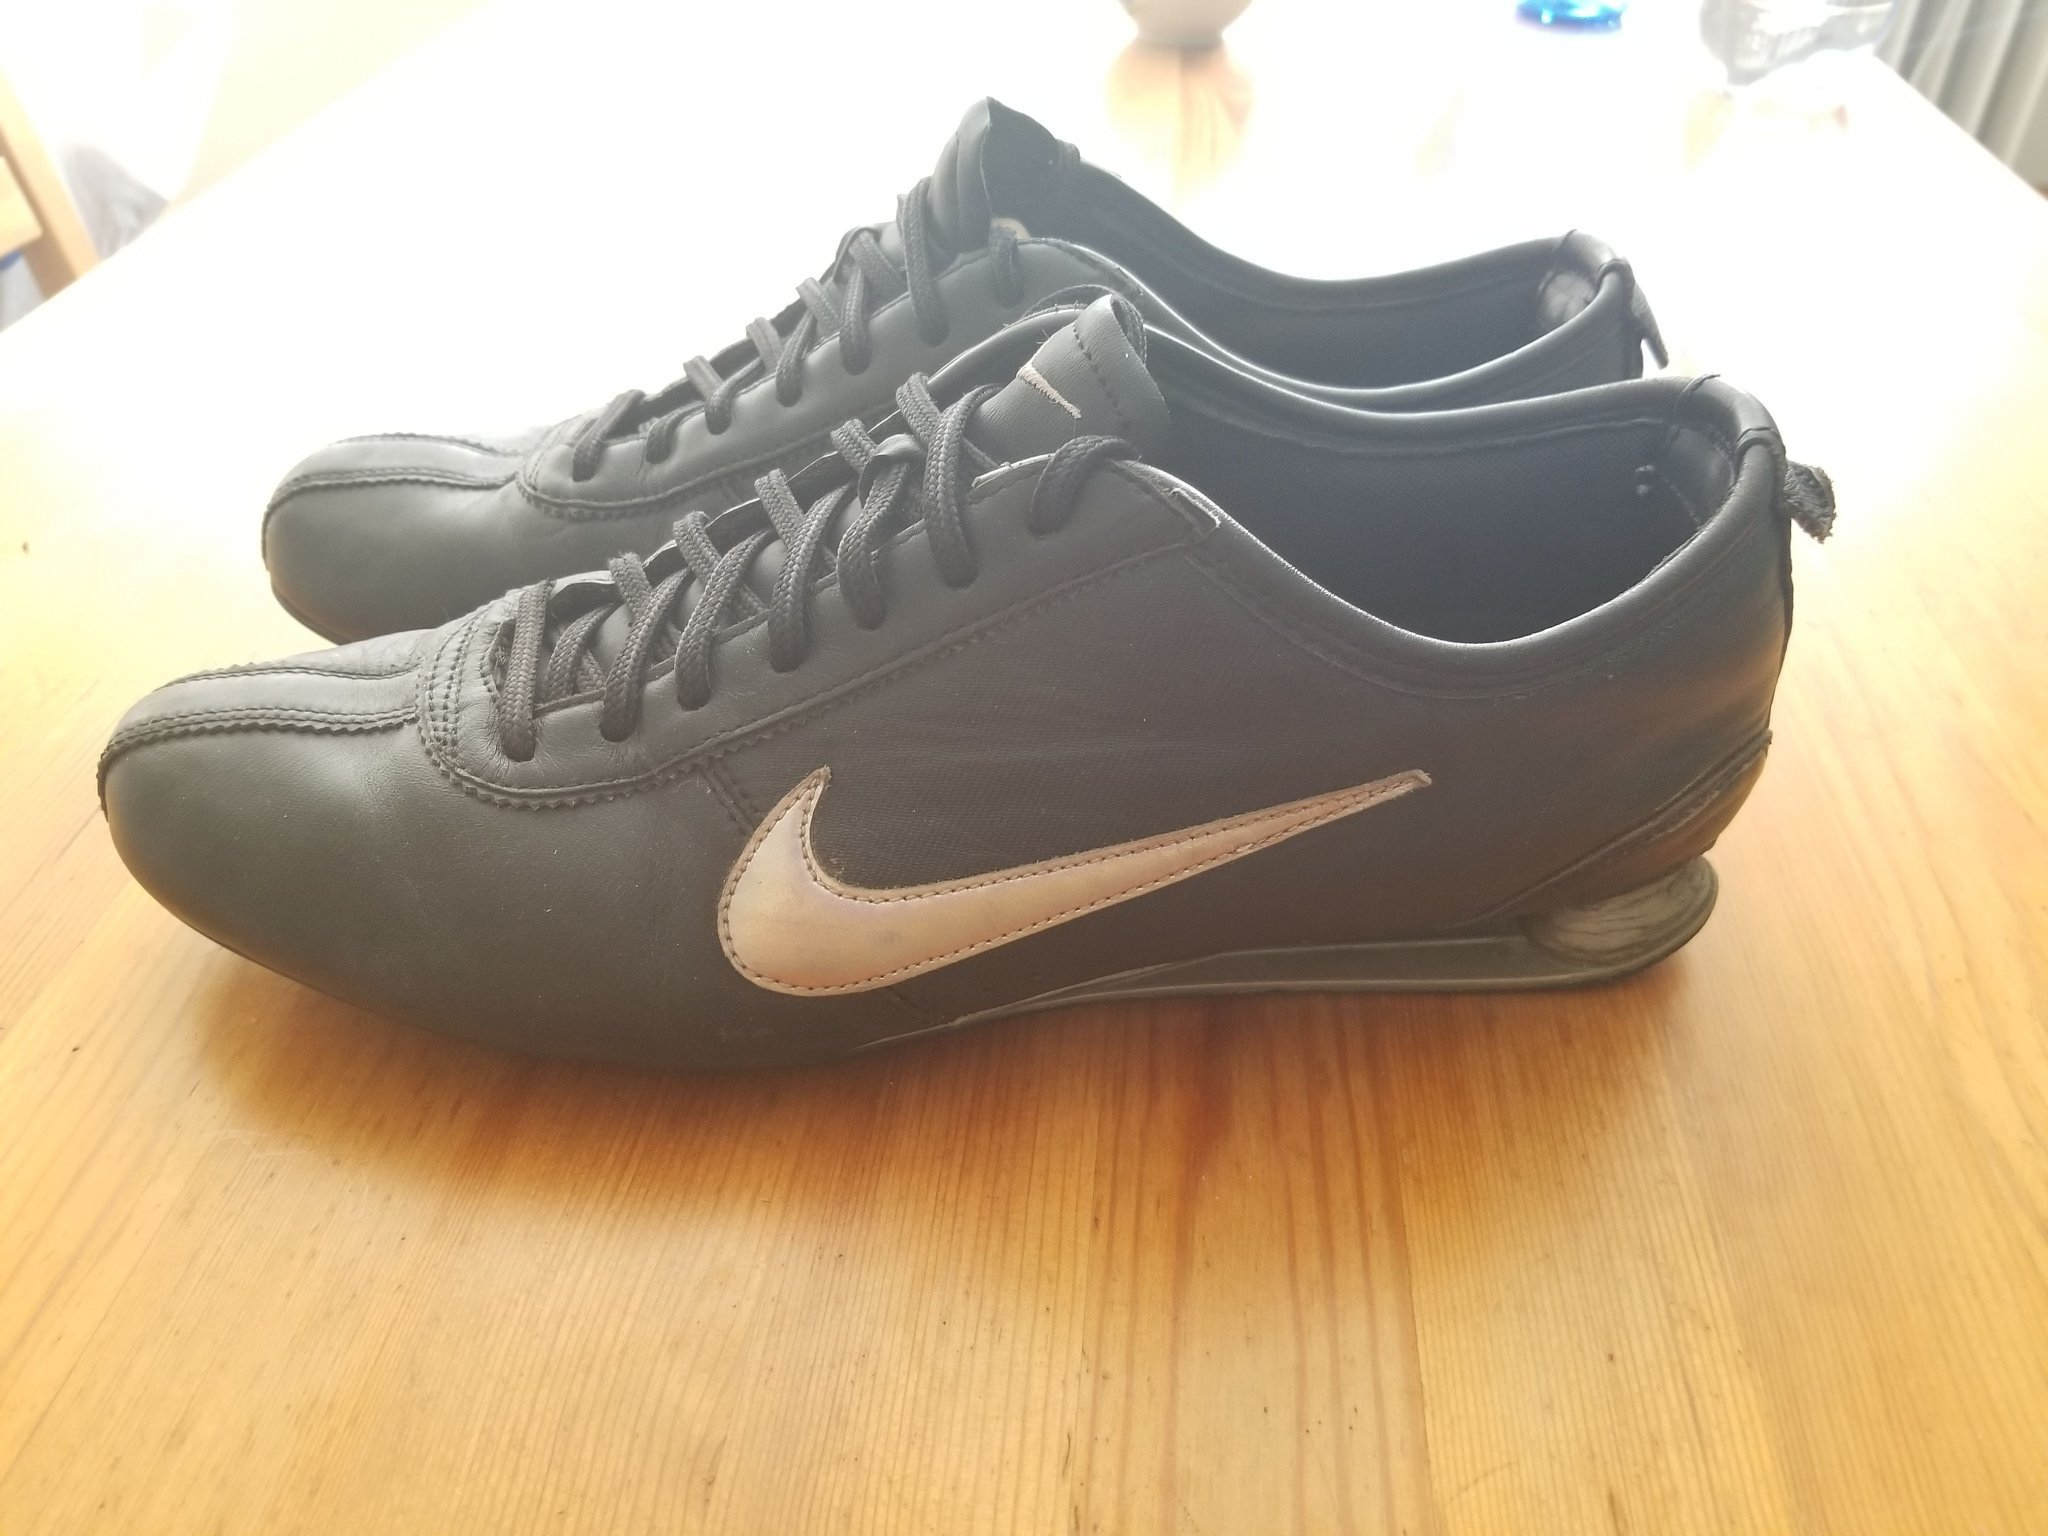 best sale san francisco exclusive shoes Nike Shox 45 (362279076) ᐈ Köp på Tradera